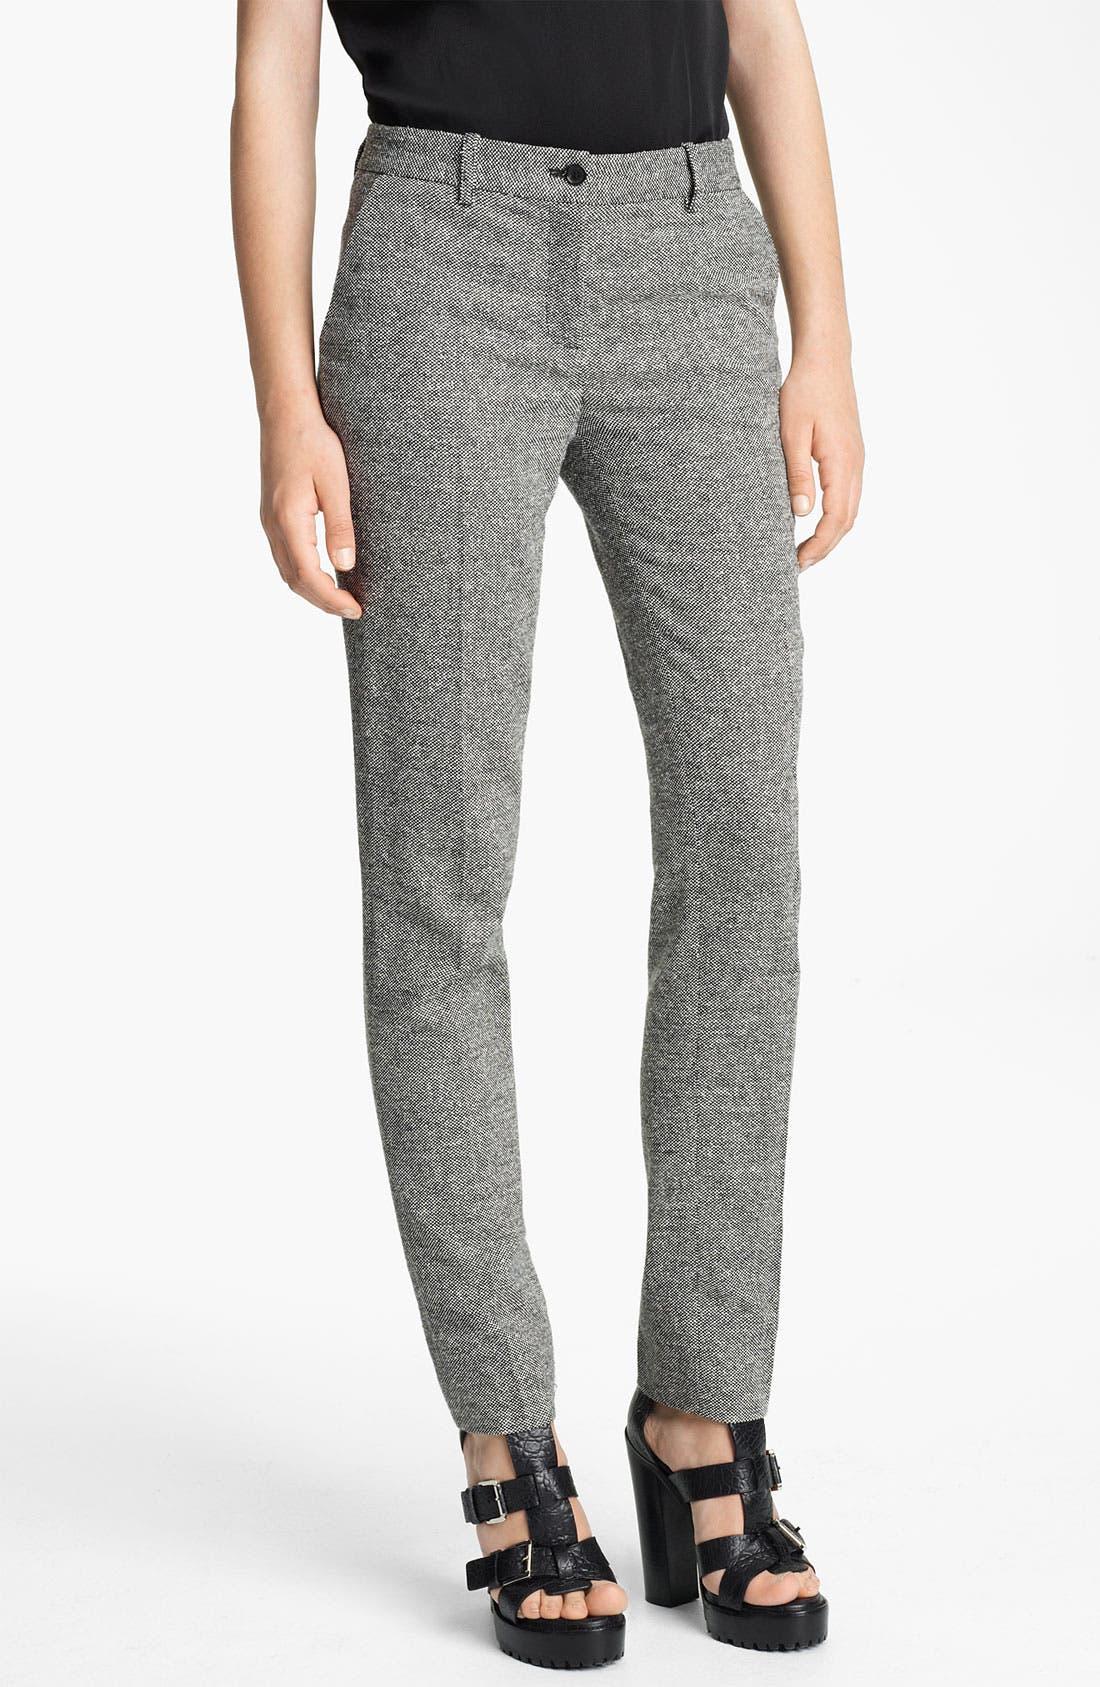 Main Image - Michael Kors 'Samantha' Skinny Donegal Tweed Pants